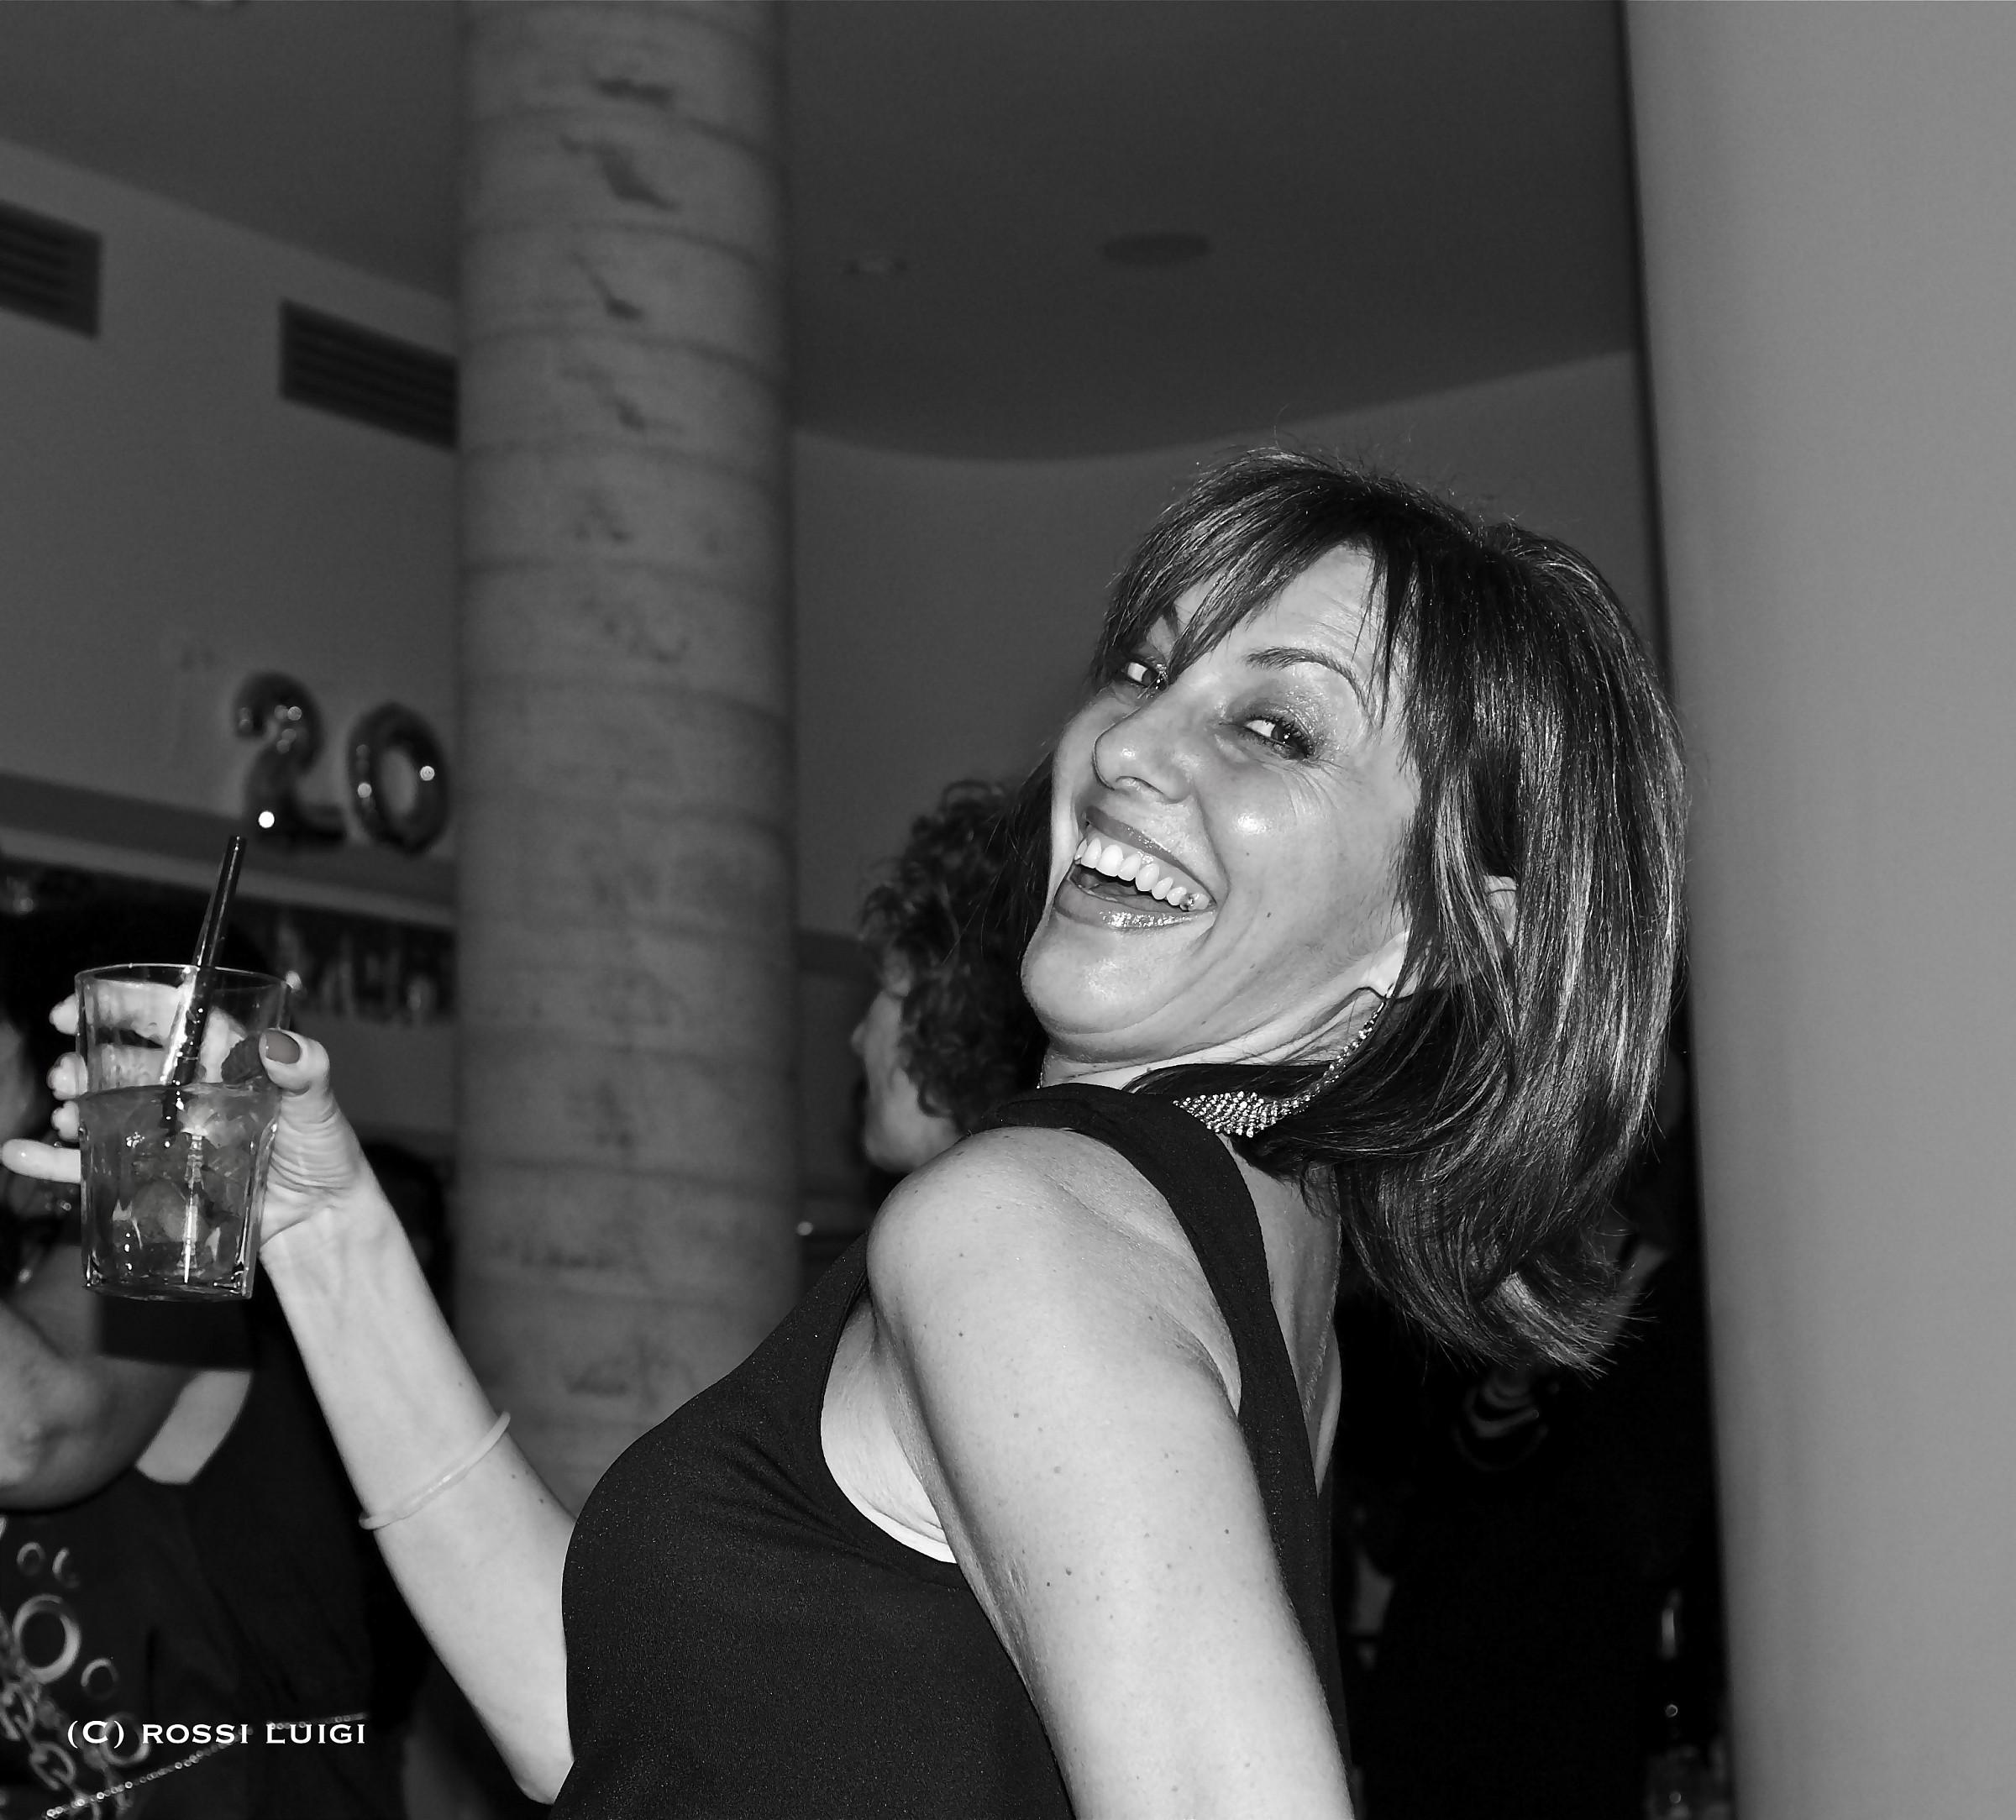 Cheers...